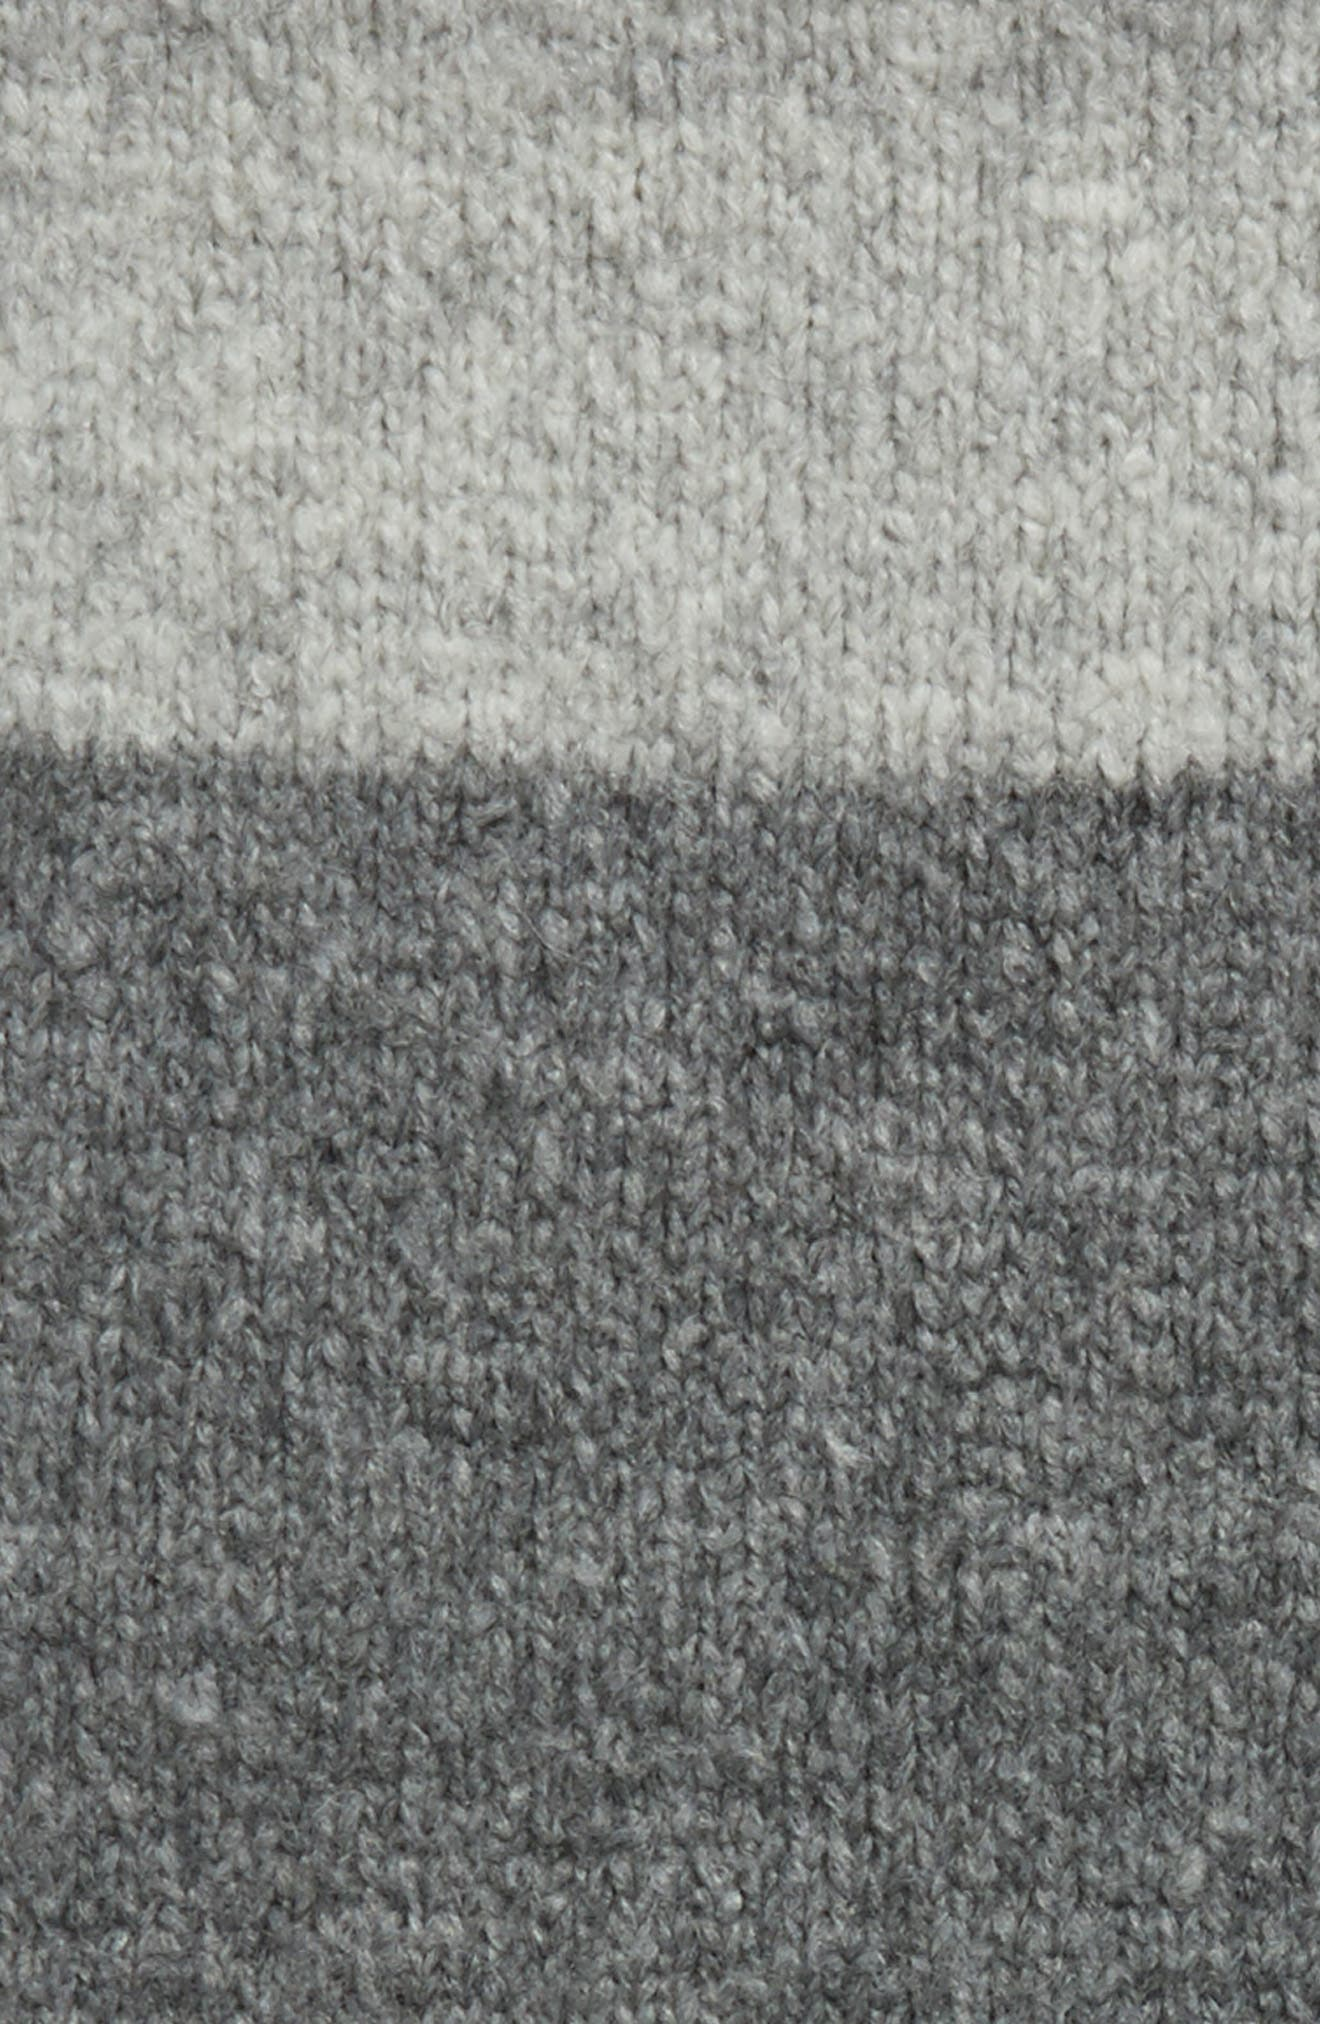 Lofty Tricolor Infinity Scarf,                             Alternate thumbnail 3, color,                             Light Grey M